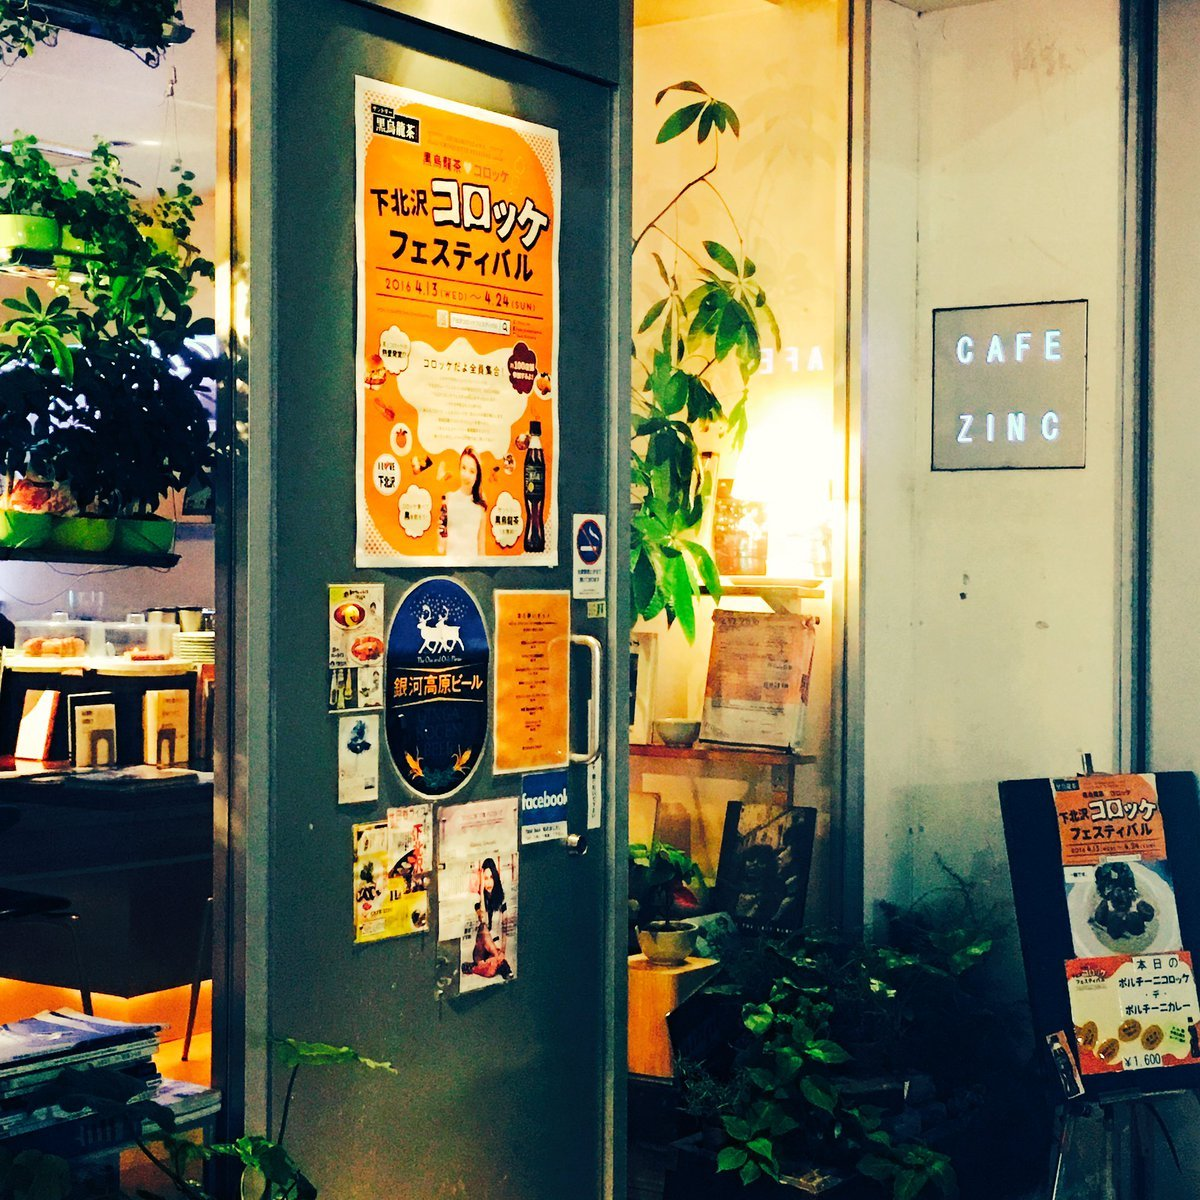 CAFE ZINC 下北沢 店舗에 대한 이미지 검색결과